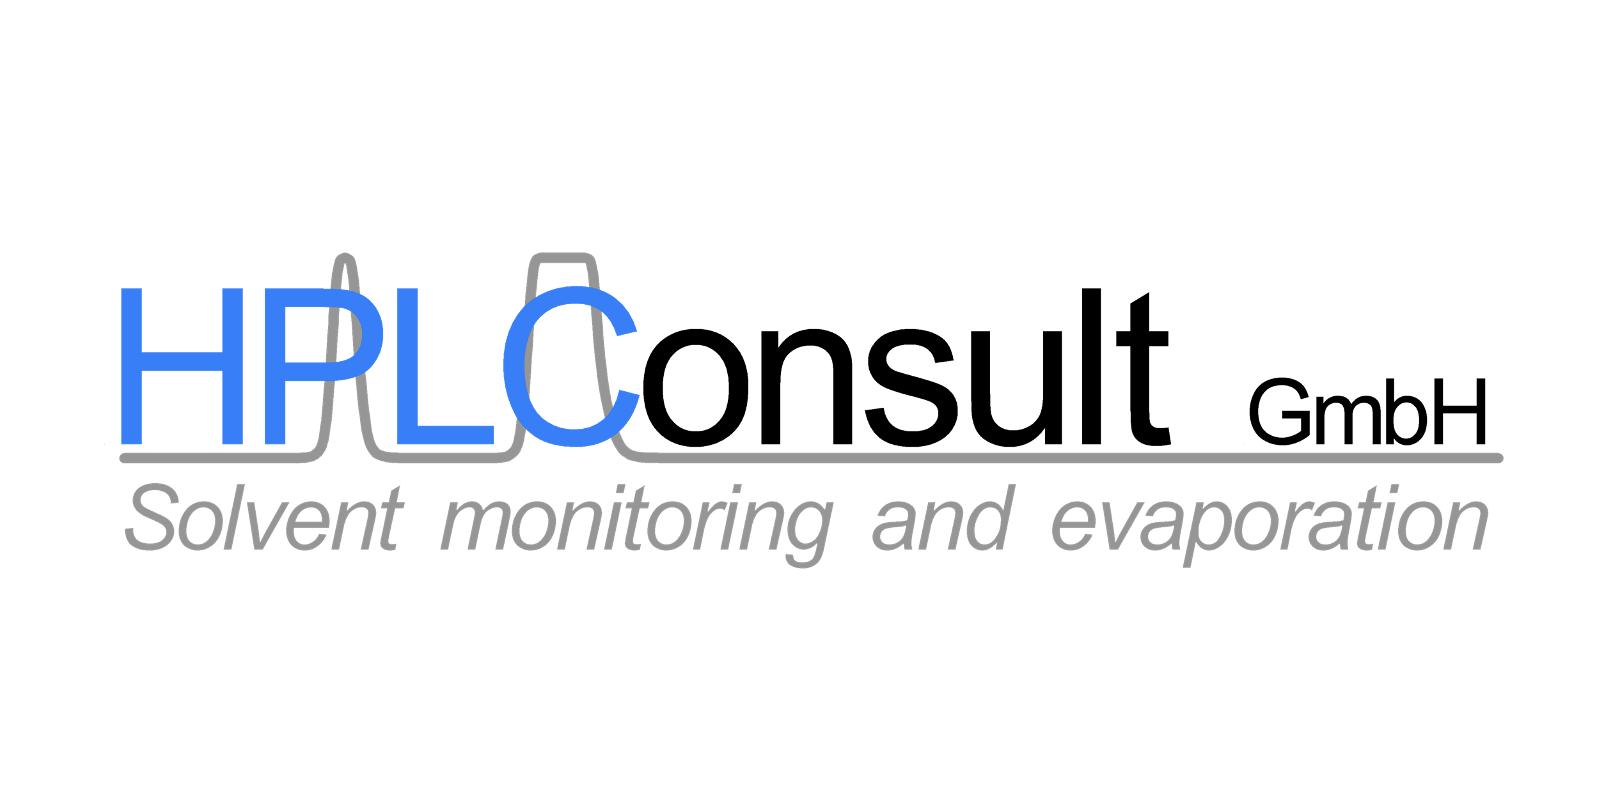 HPLConsult GmbH